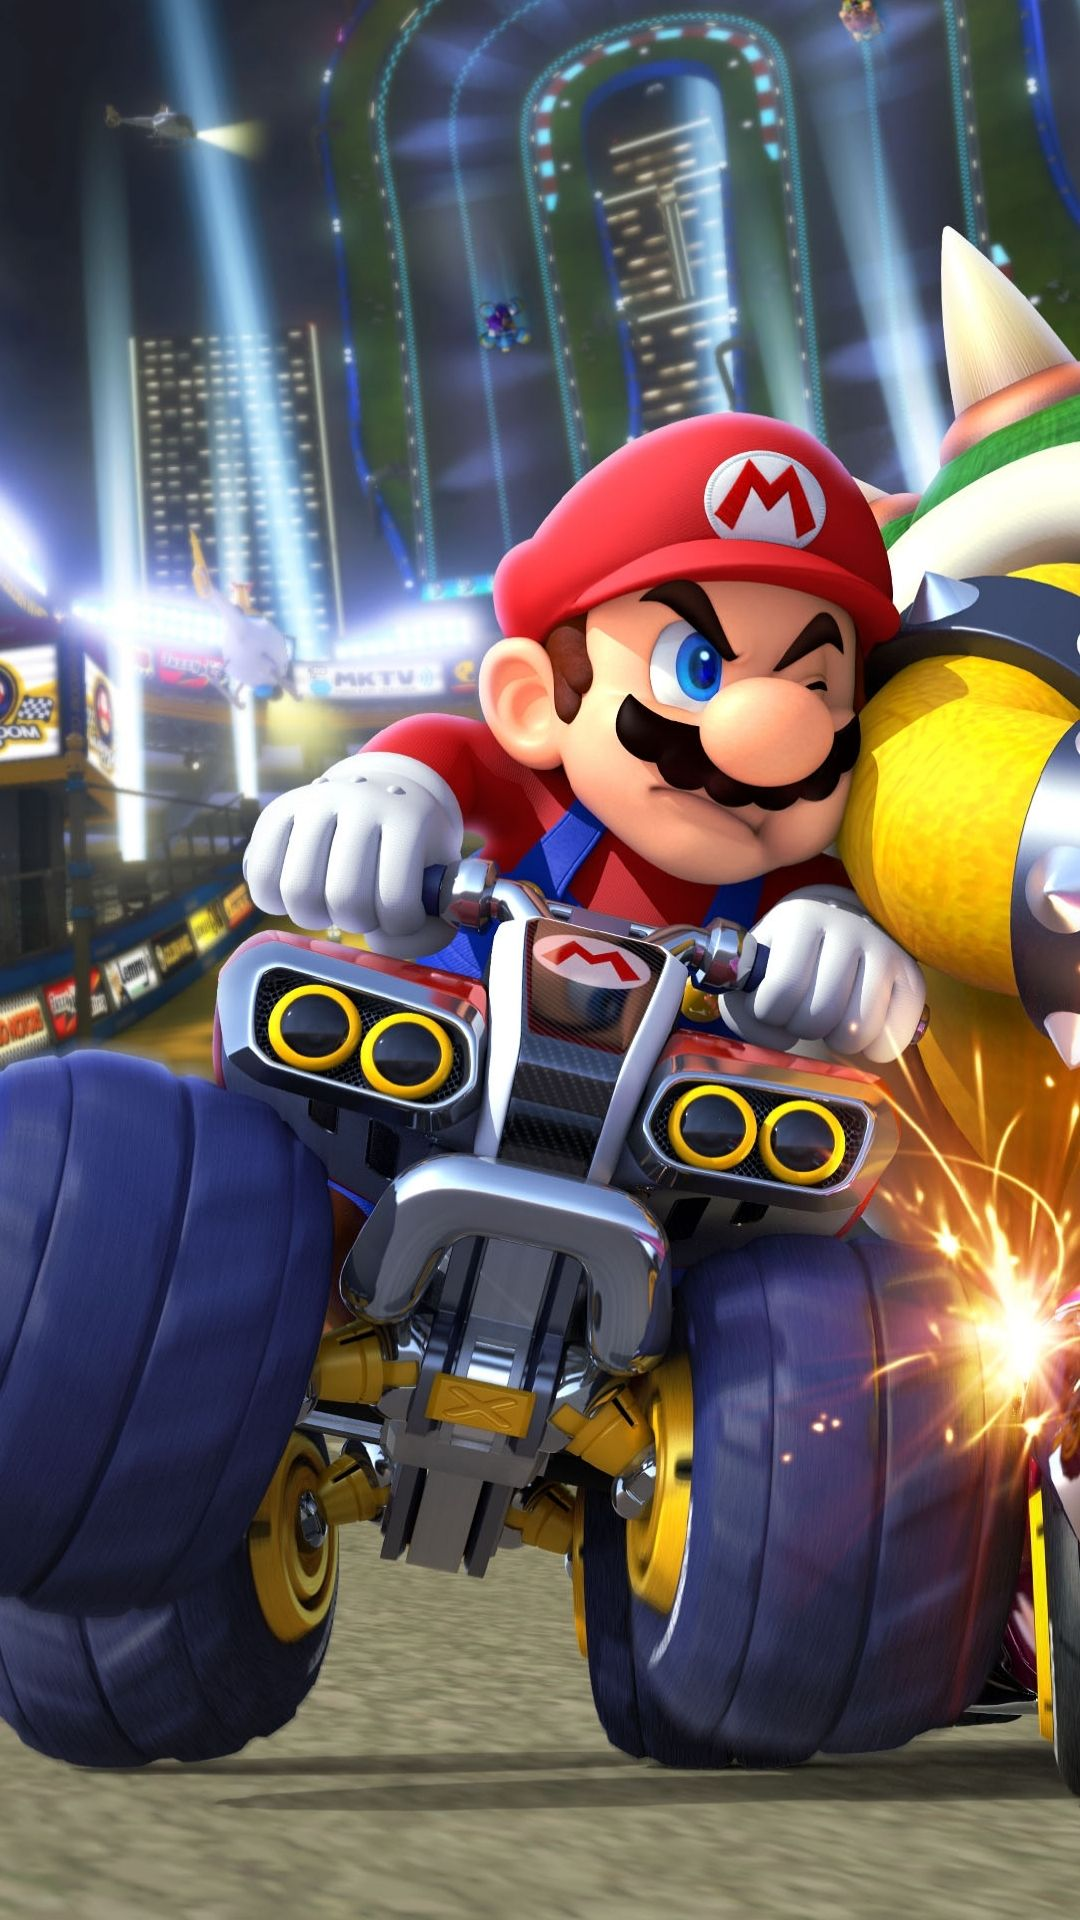 Mario Fighter Race Car In Mario Kart Desenhos Do Mario Desenho Super Mario Personagens De Videogame